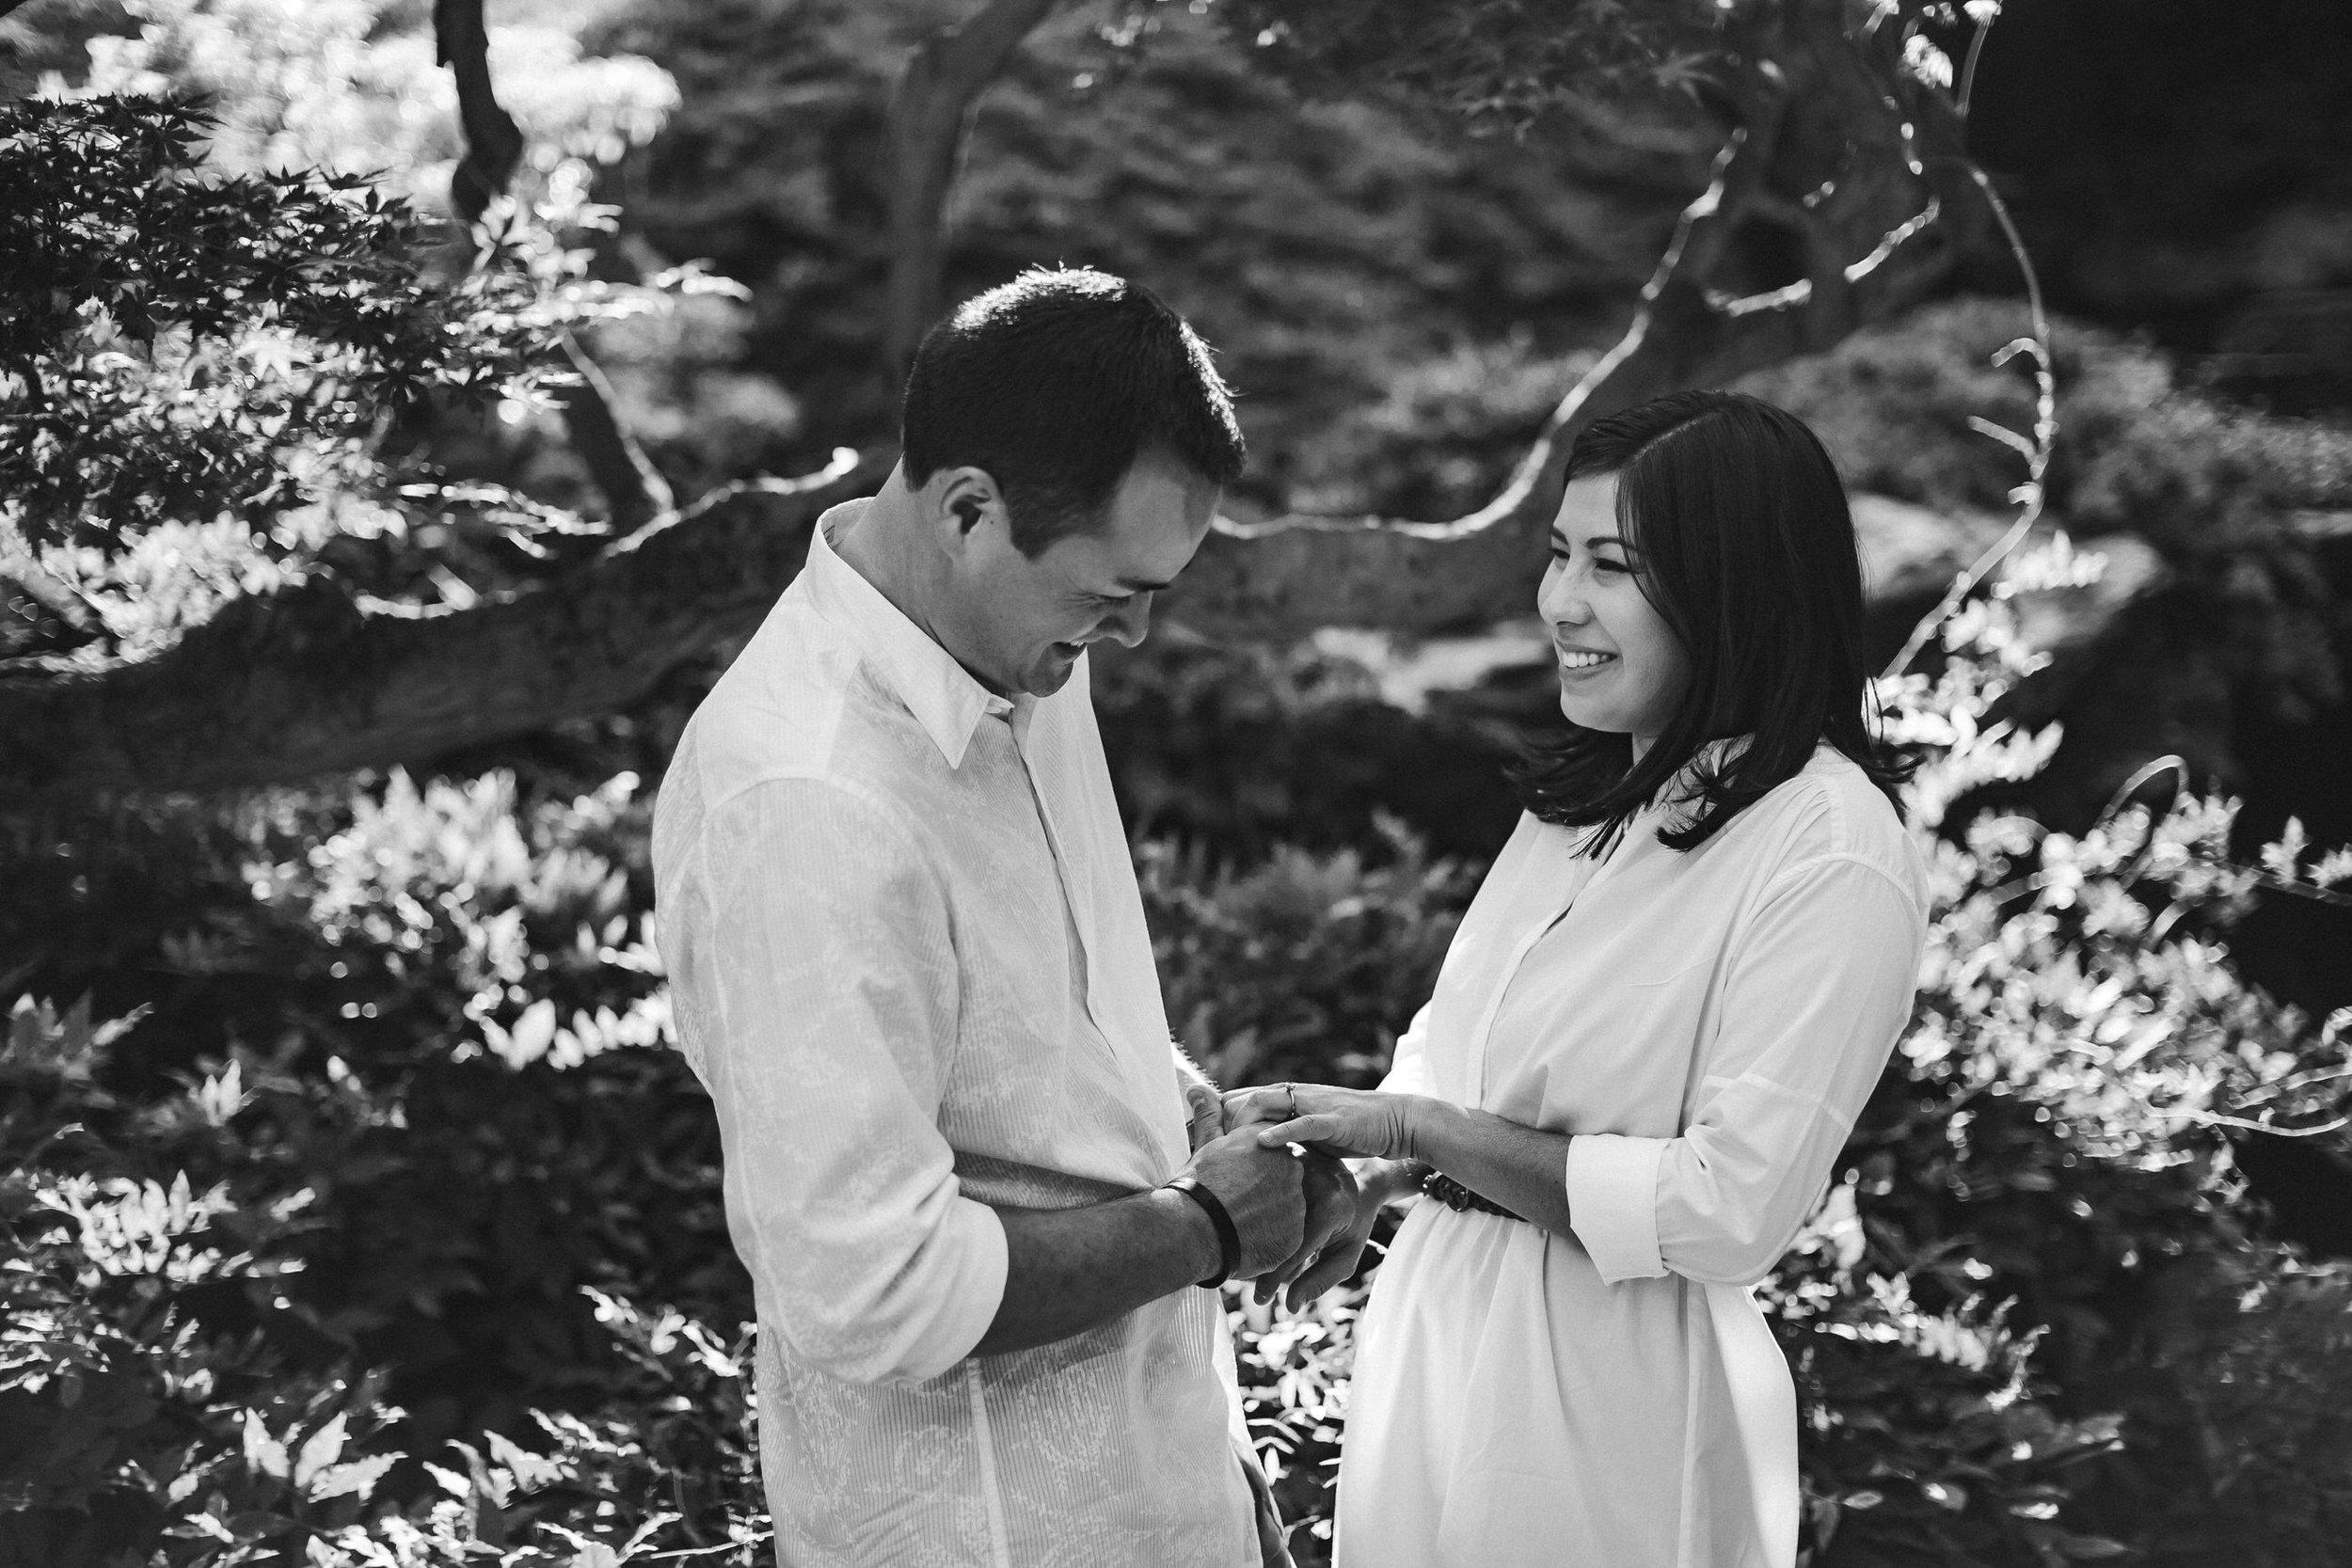 moments_laughter_love_tiny_house_photo_destination_engagement_photographer_weddings.jpg